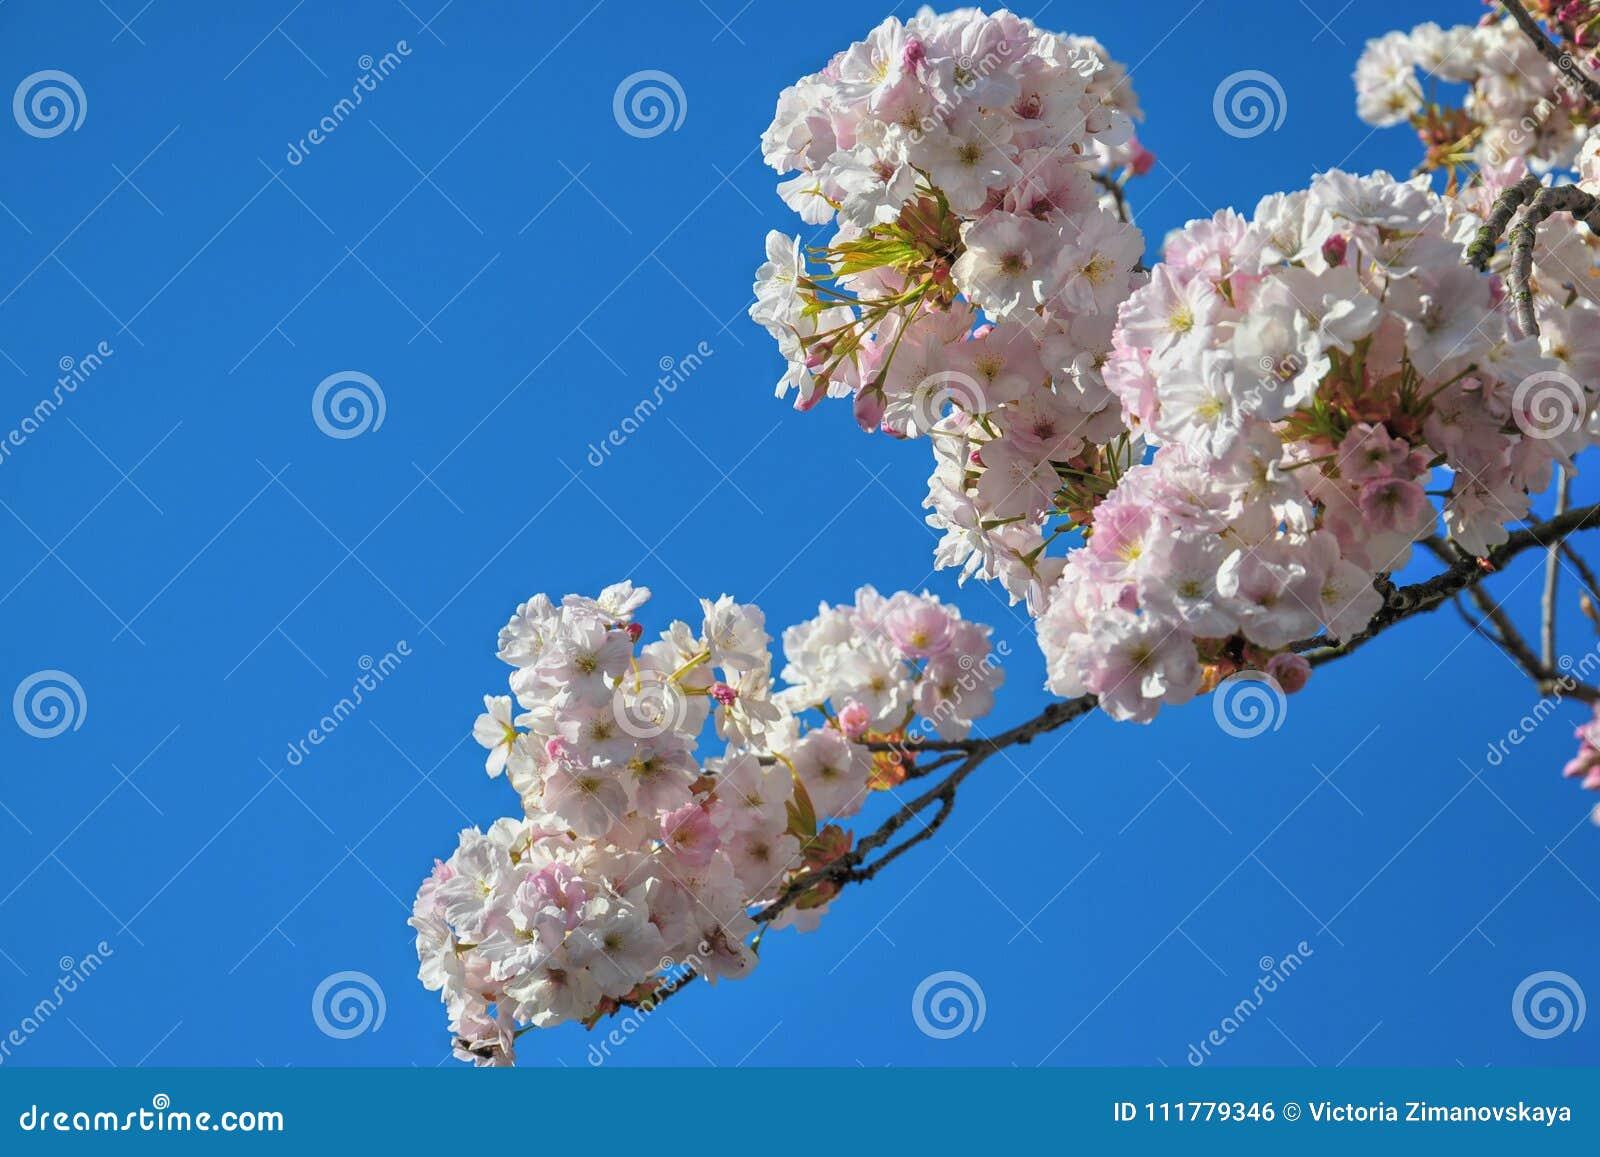 Blossom of pink sakura flowers on a spring cherry tree branch. Macro close up shot